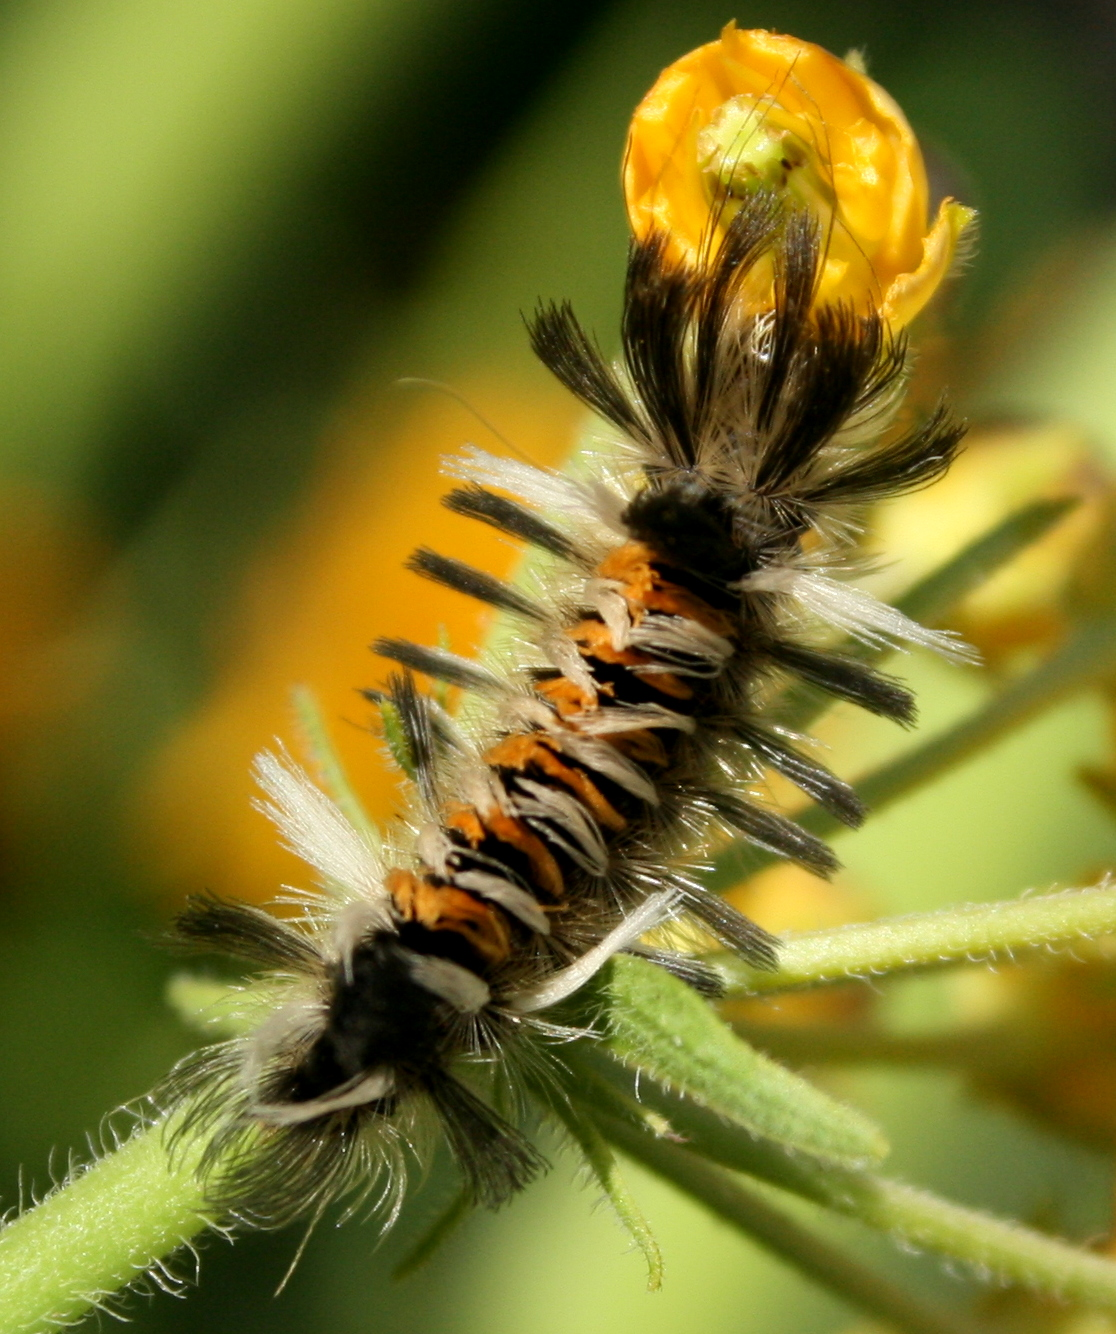 Gray Caterpillars That Are Big: South Englishtown Gazette: A Punk Caterpillar On Milkweed